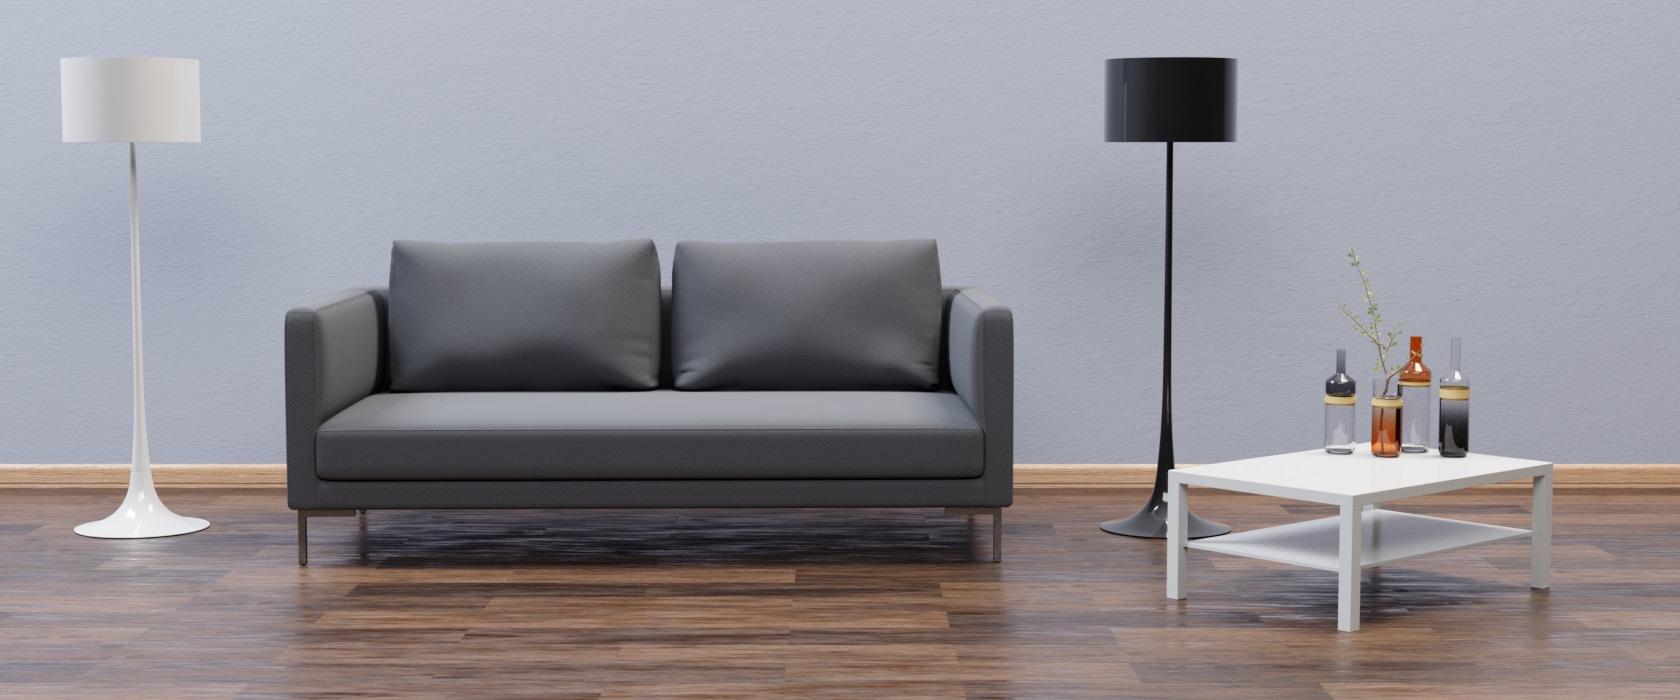 Двомісний диван Augusto - Фото 2 - Pufetto